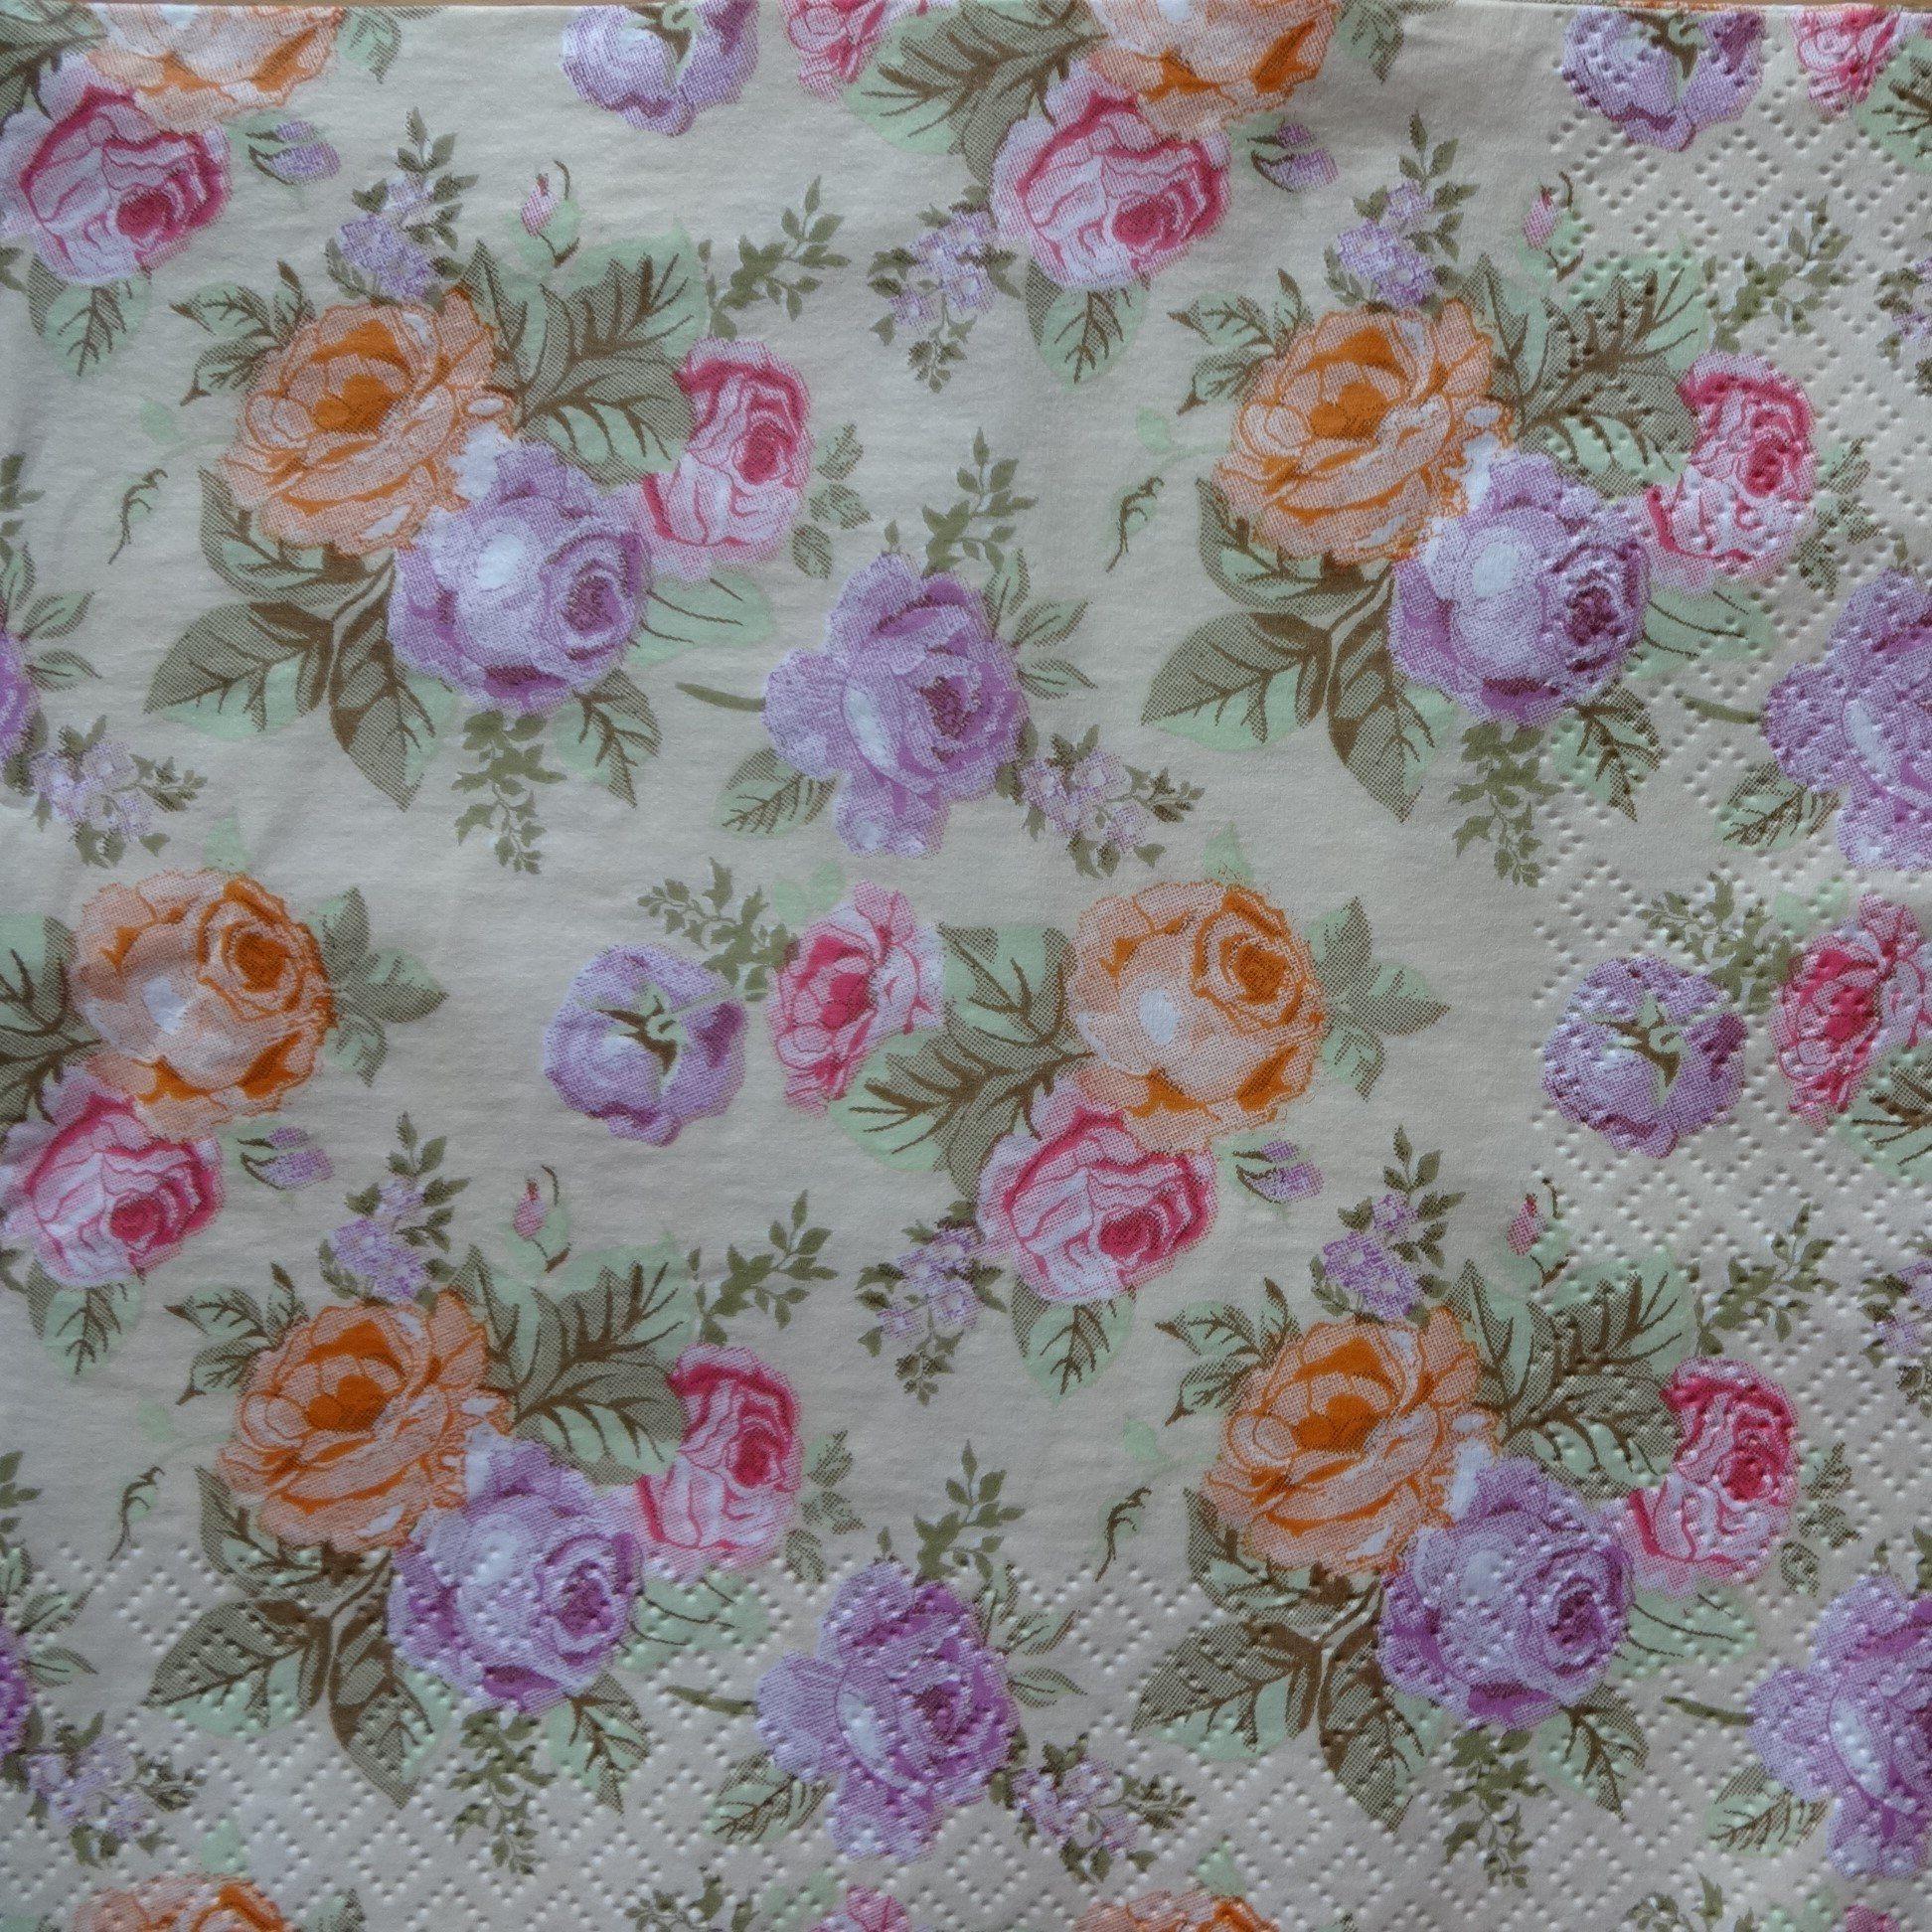 4 Watercolor  Purple Flower Paper Napkins Crafts Supplies Decoupage Paper B.New